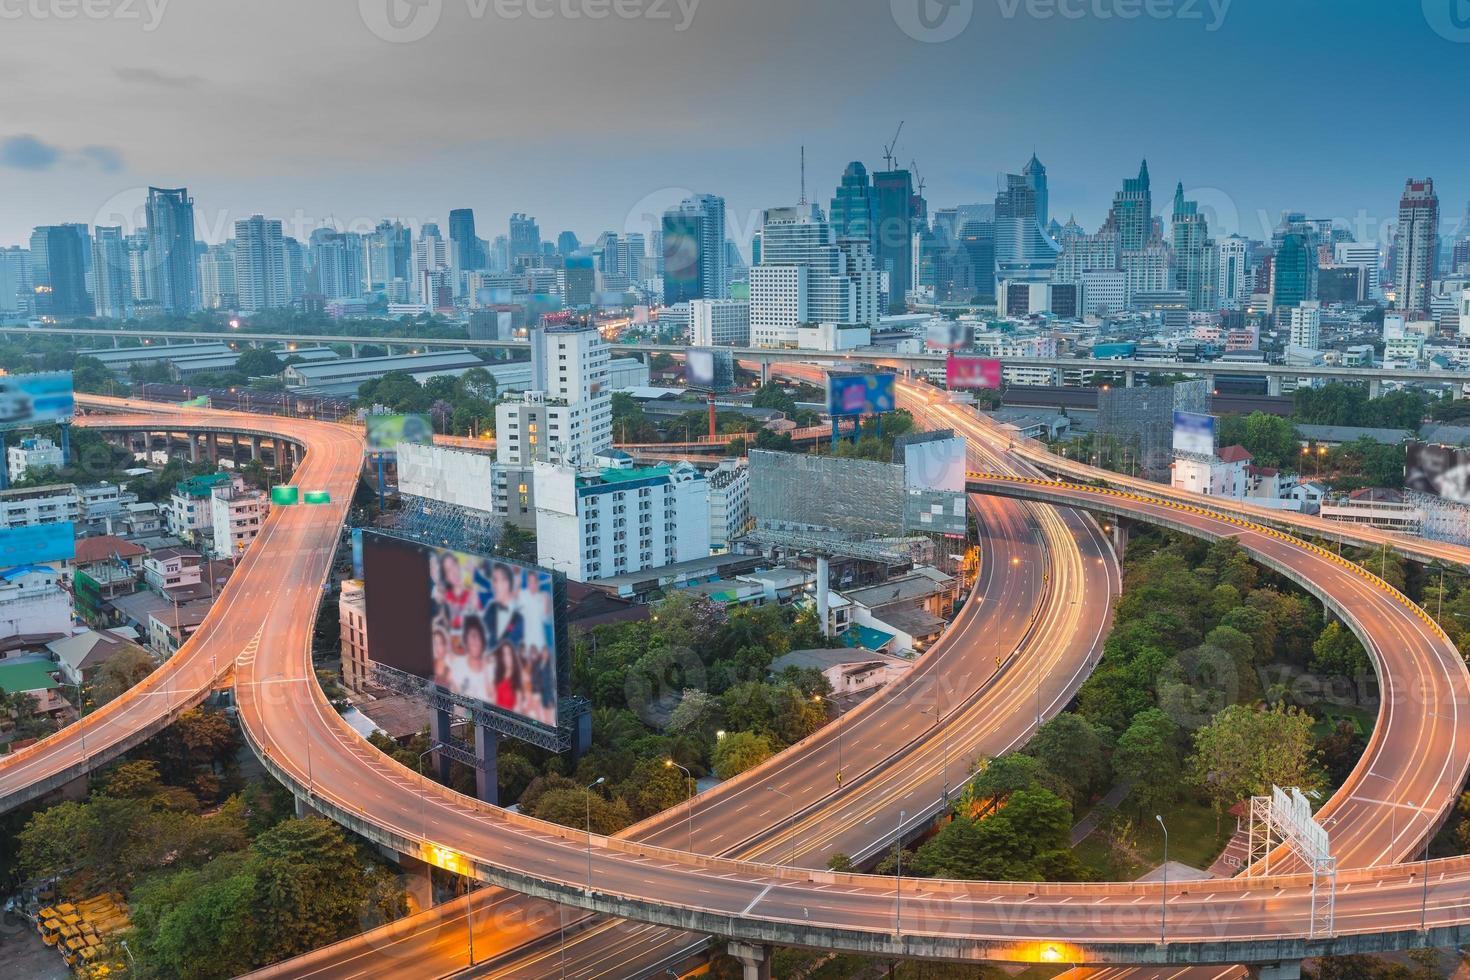 Before working hour of Bangkok city express way photo